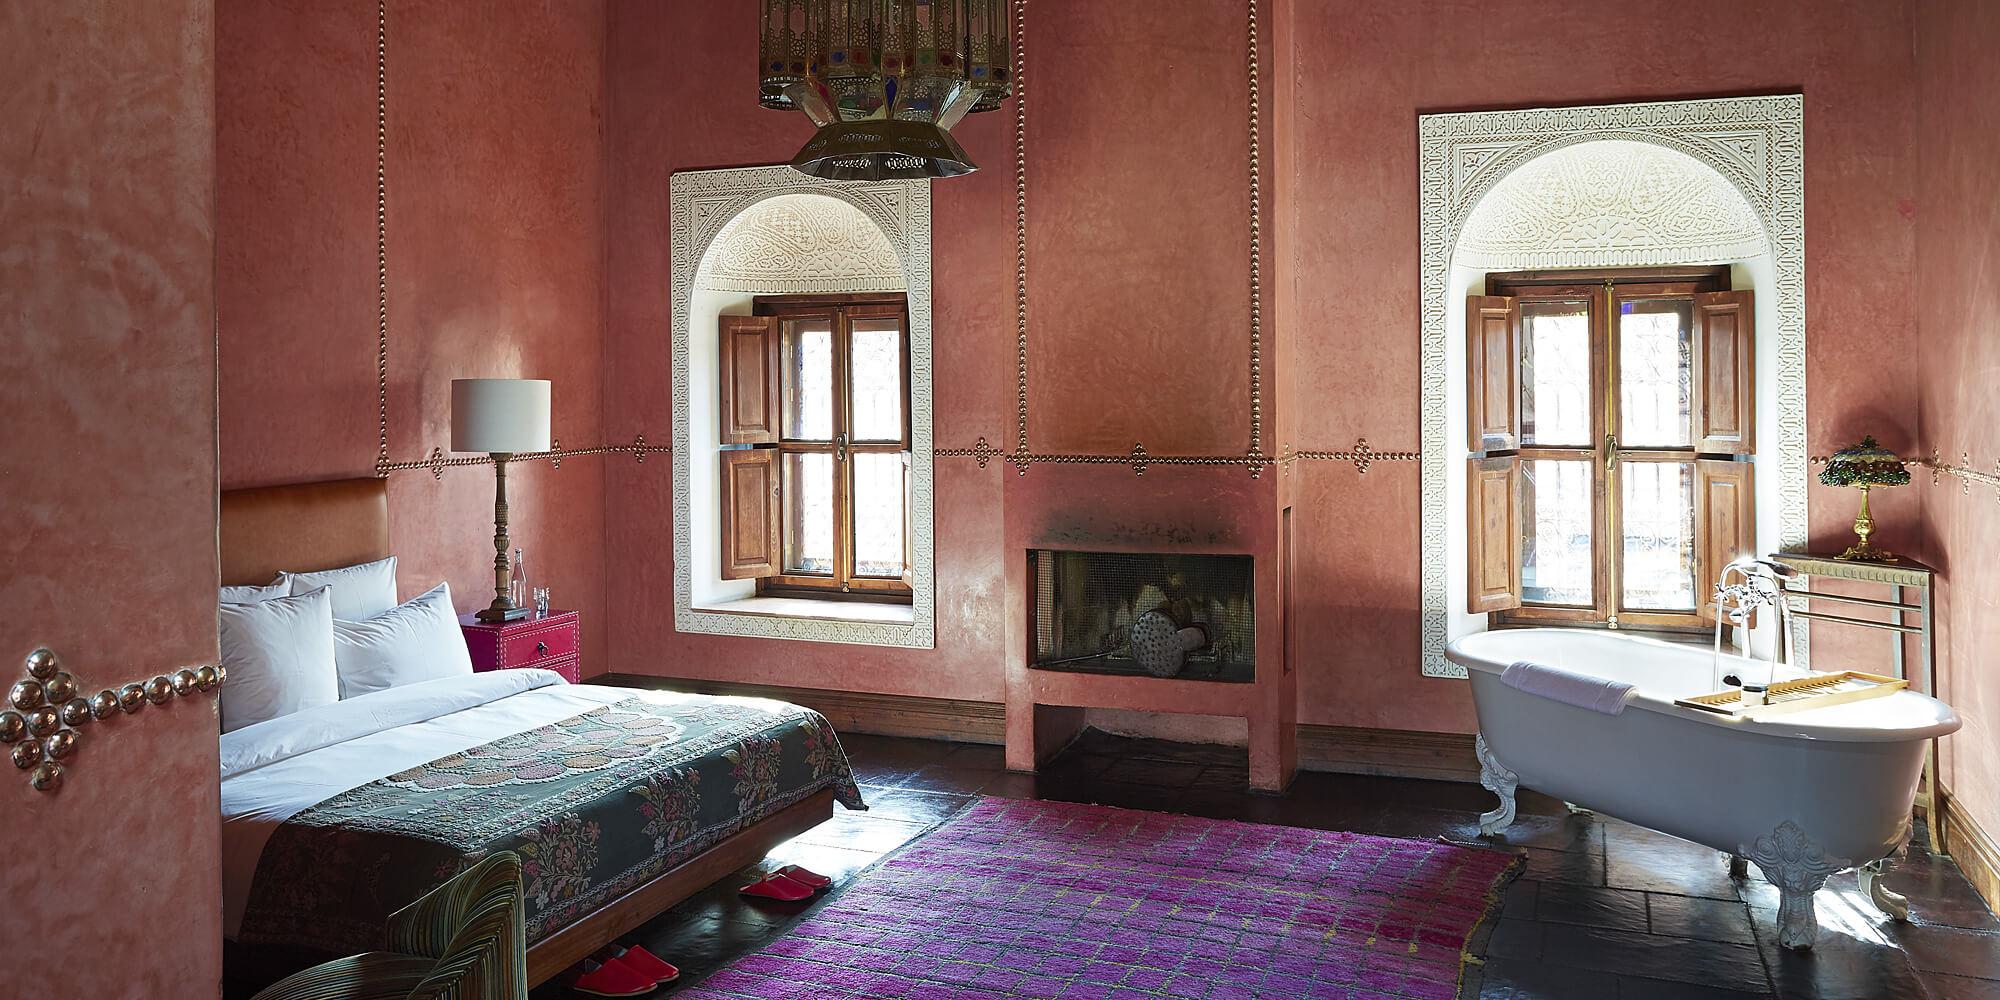 The_best_riads_in_marrakech_el_fenn